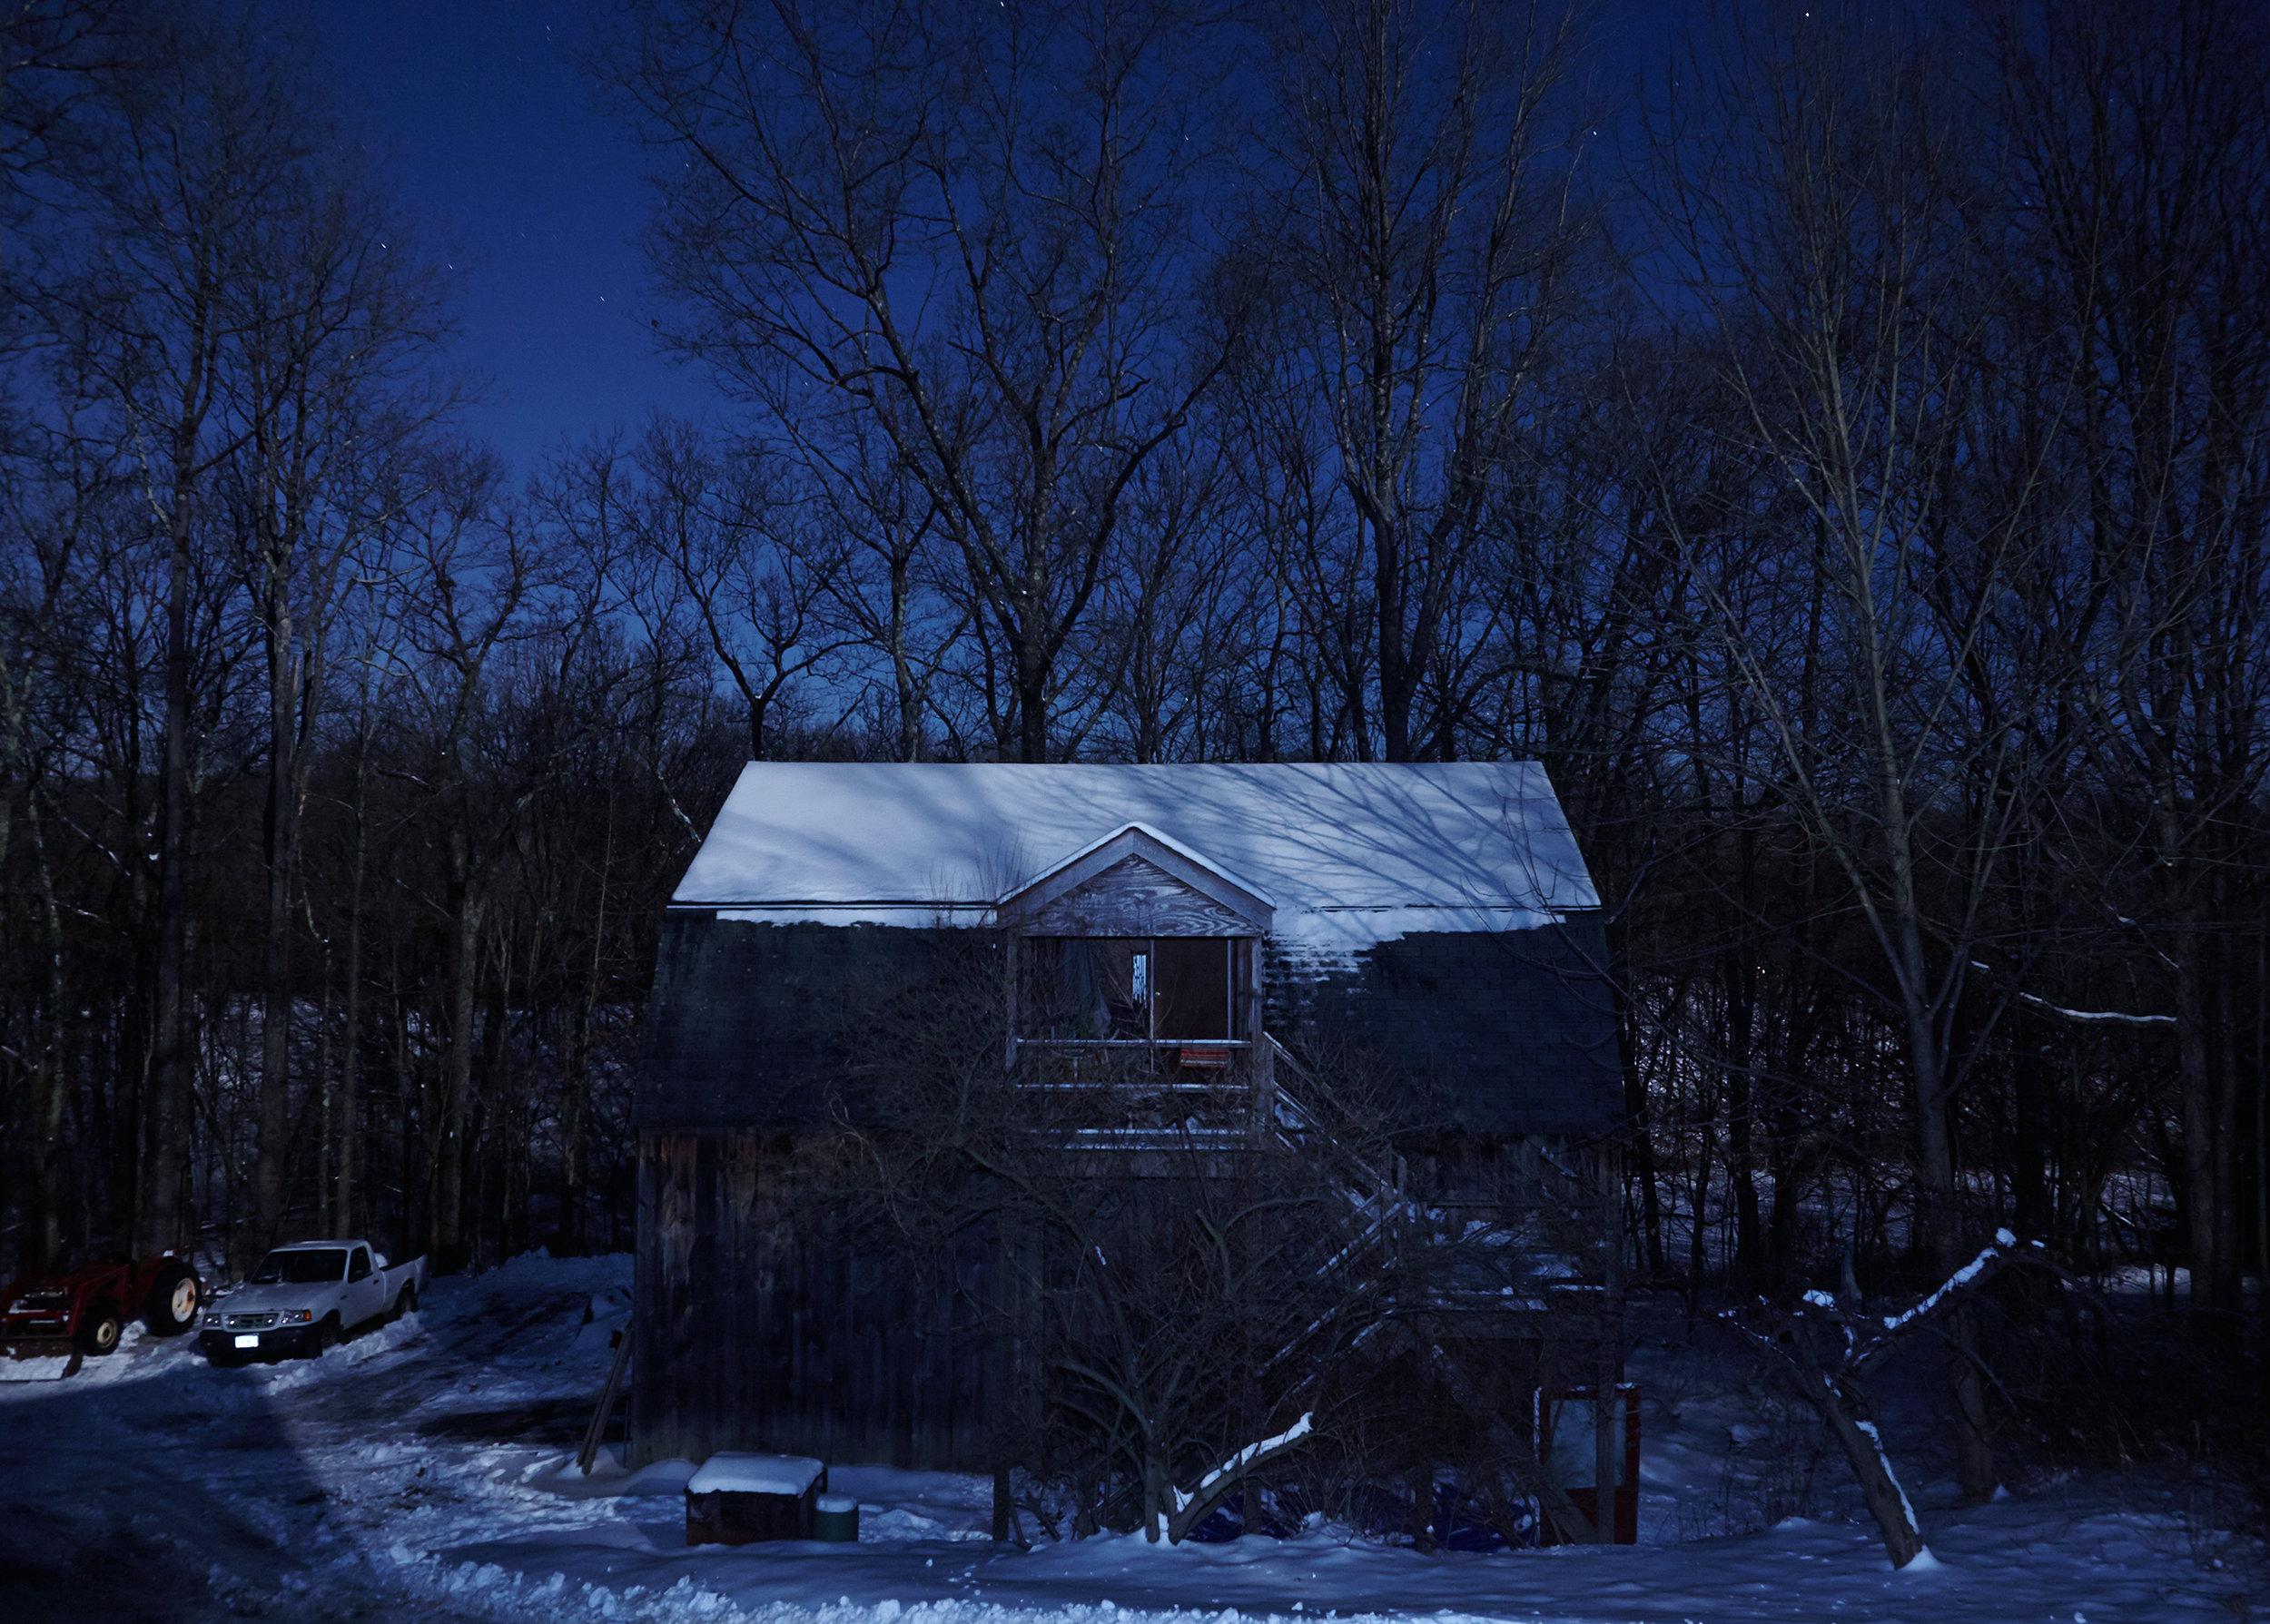 BARN-AT-WINTERS-END-CT-©-JONATHAN-R.-BECKERMAN-PHOTOGRAPHY-2013.jpg